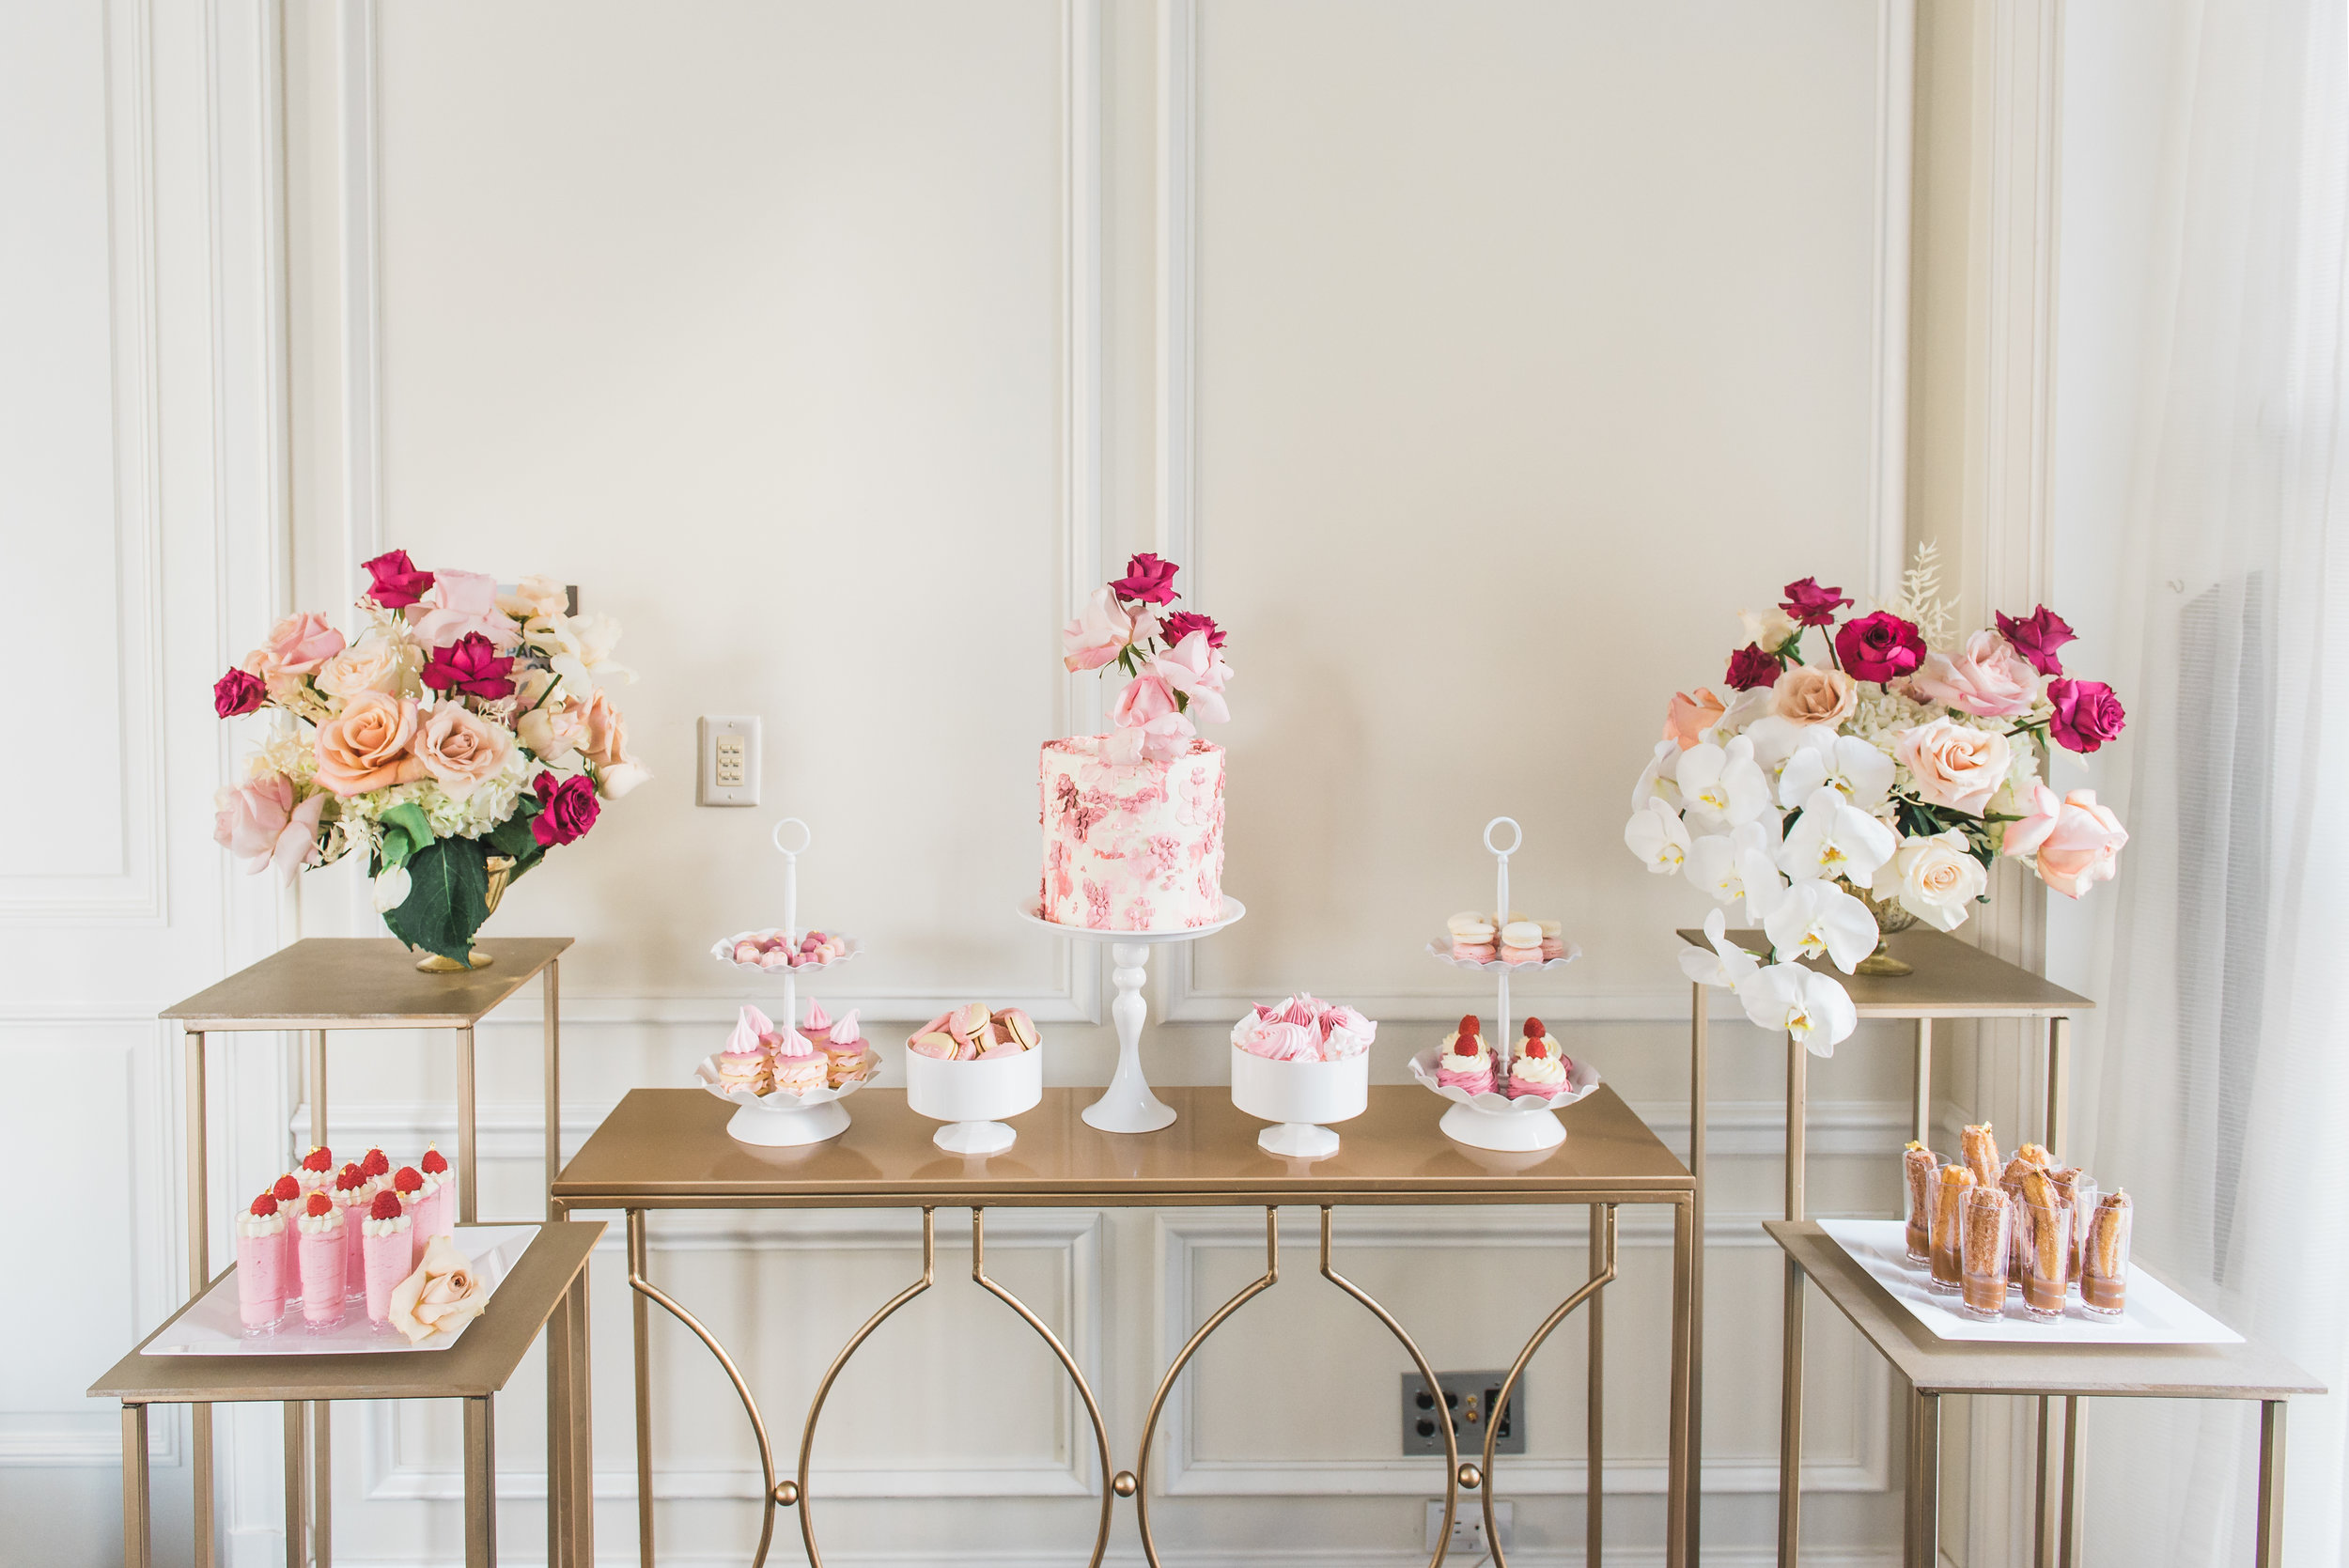 table-co-rosewood-set1-details-3.JPG